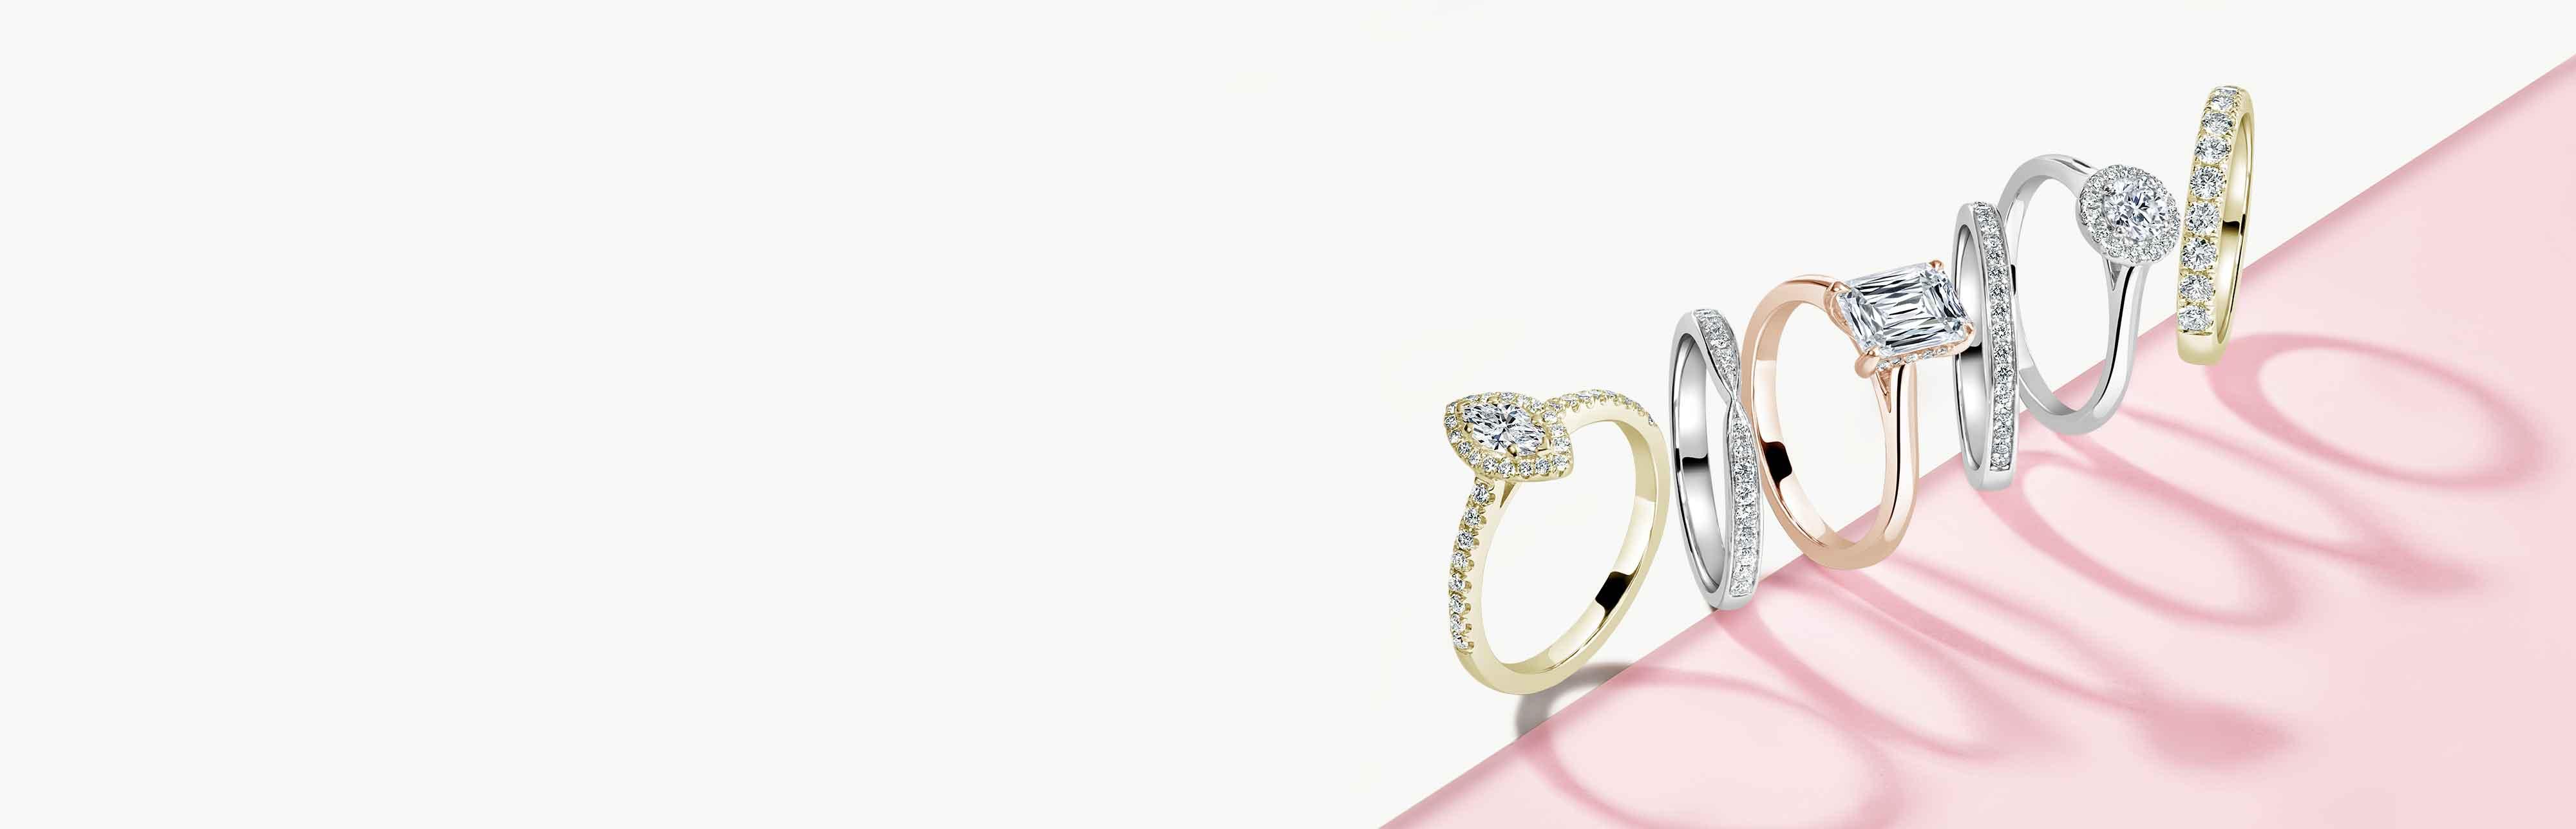 Rose Gold Cushion Cut Engagement Rings - Steven Stone